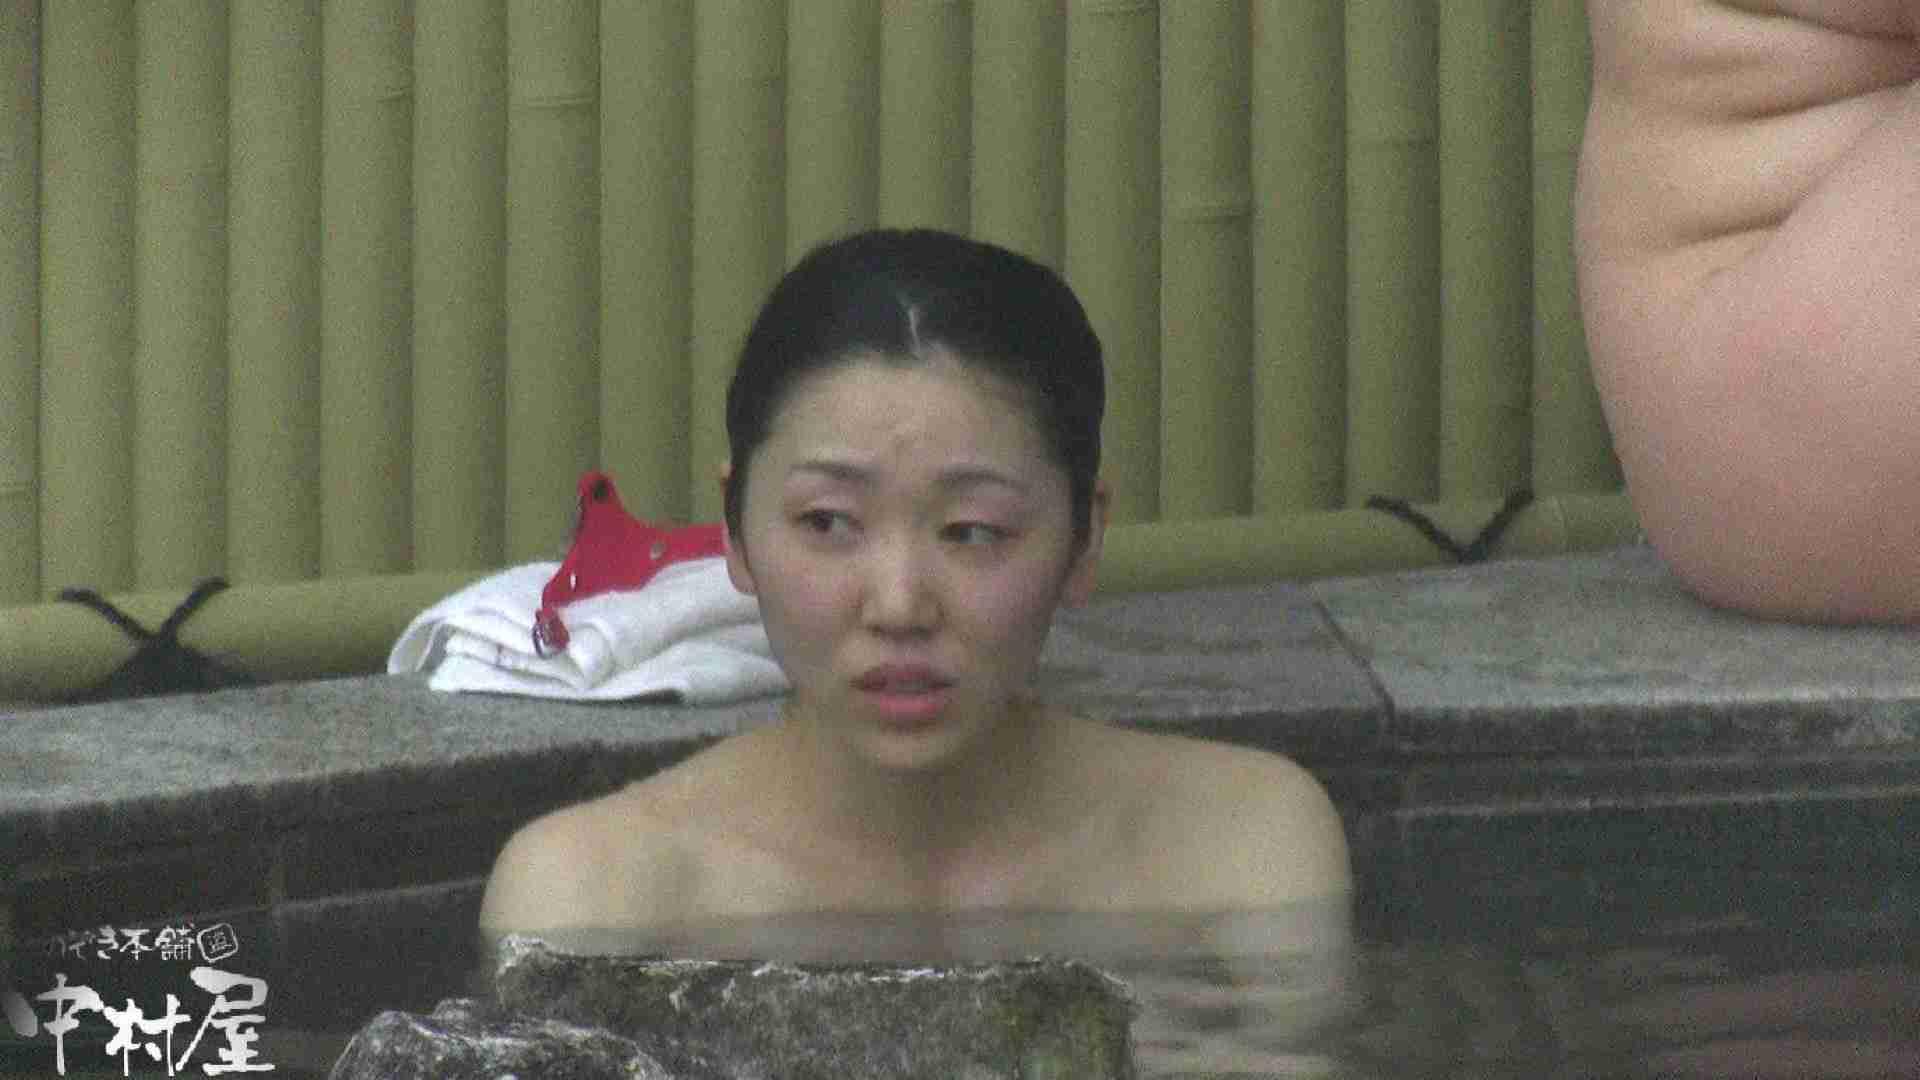 Aquaな露天風呂Vol.917 盗撮シリーズ   露天風呂編  108PIX 35